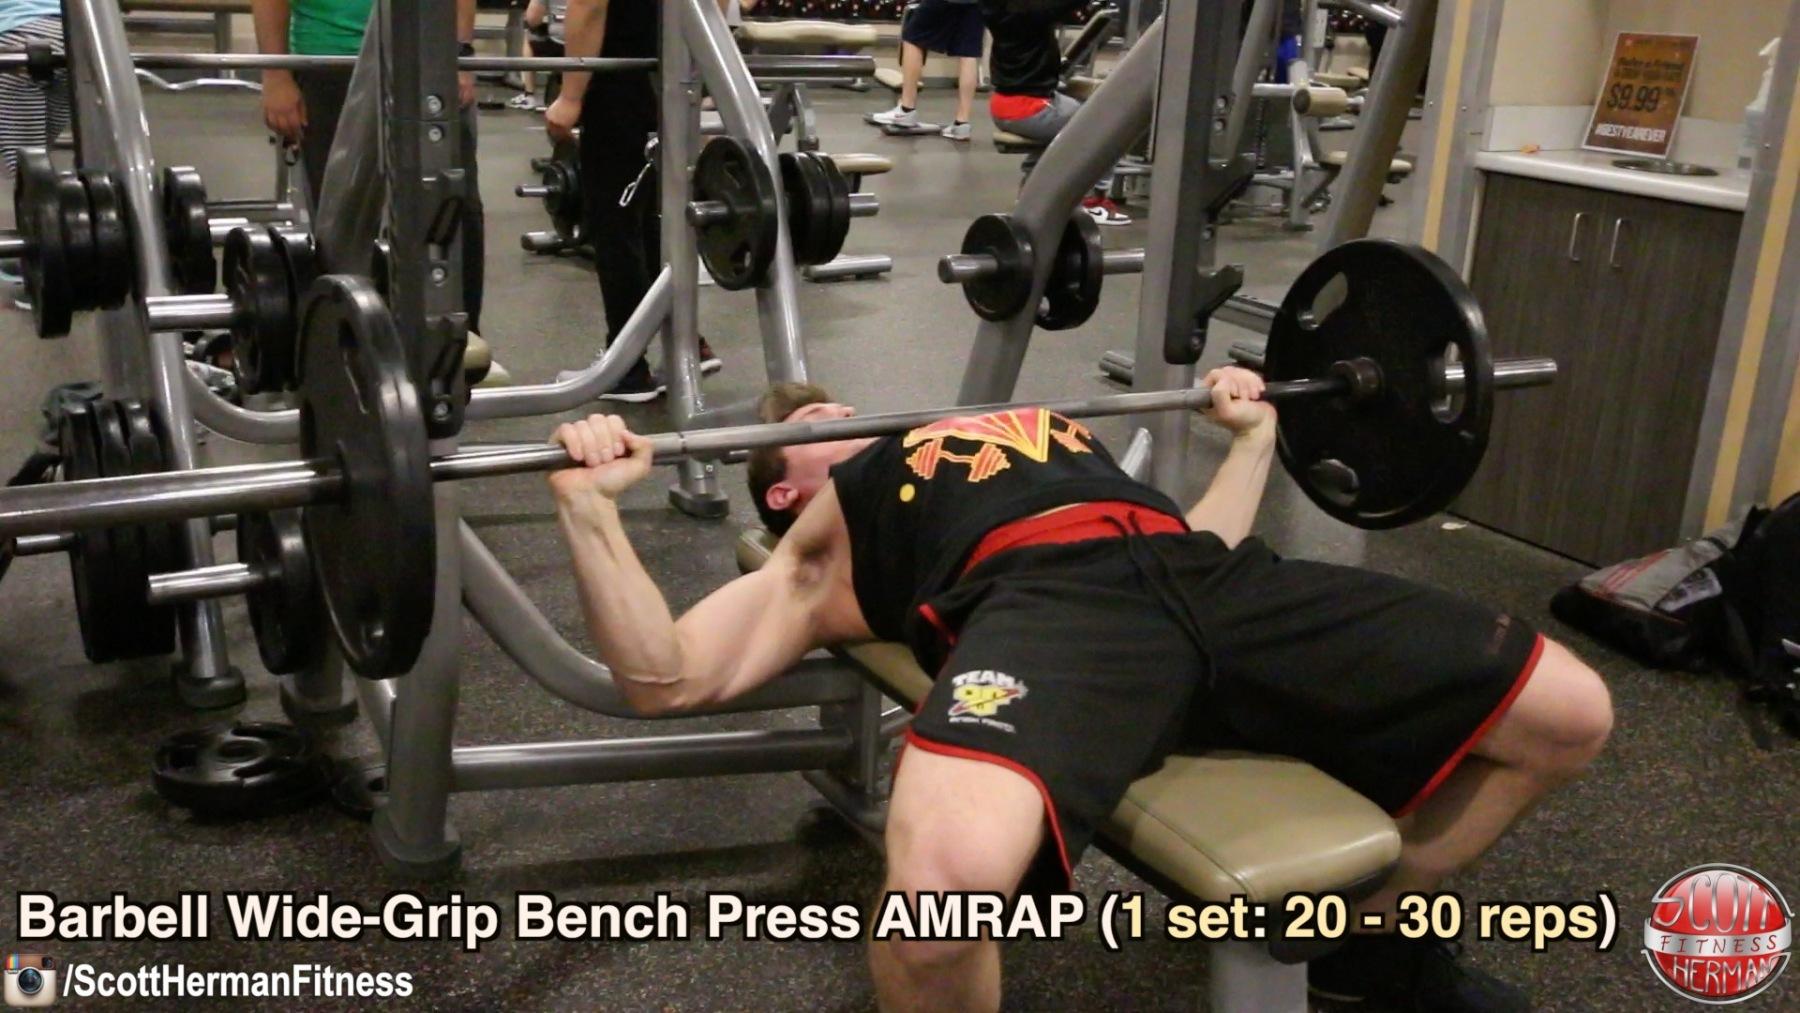 barbell-wide-grip-bench-press-amrap